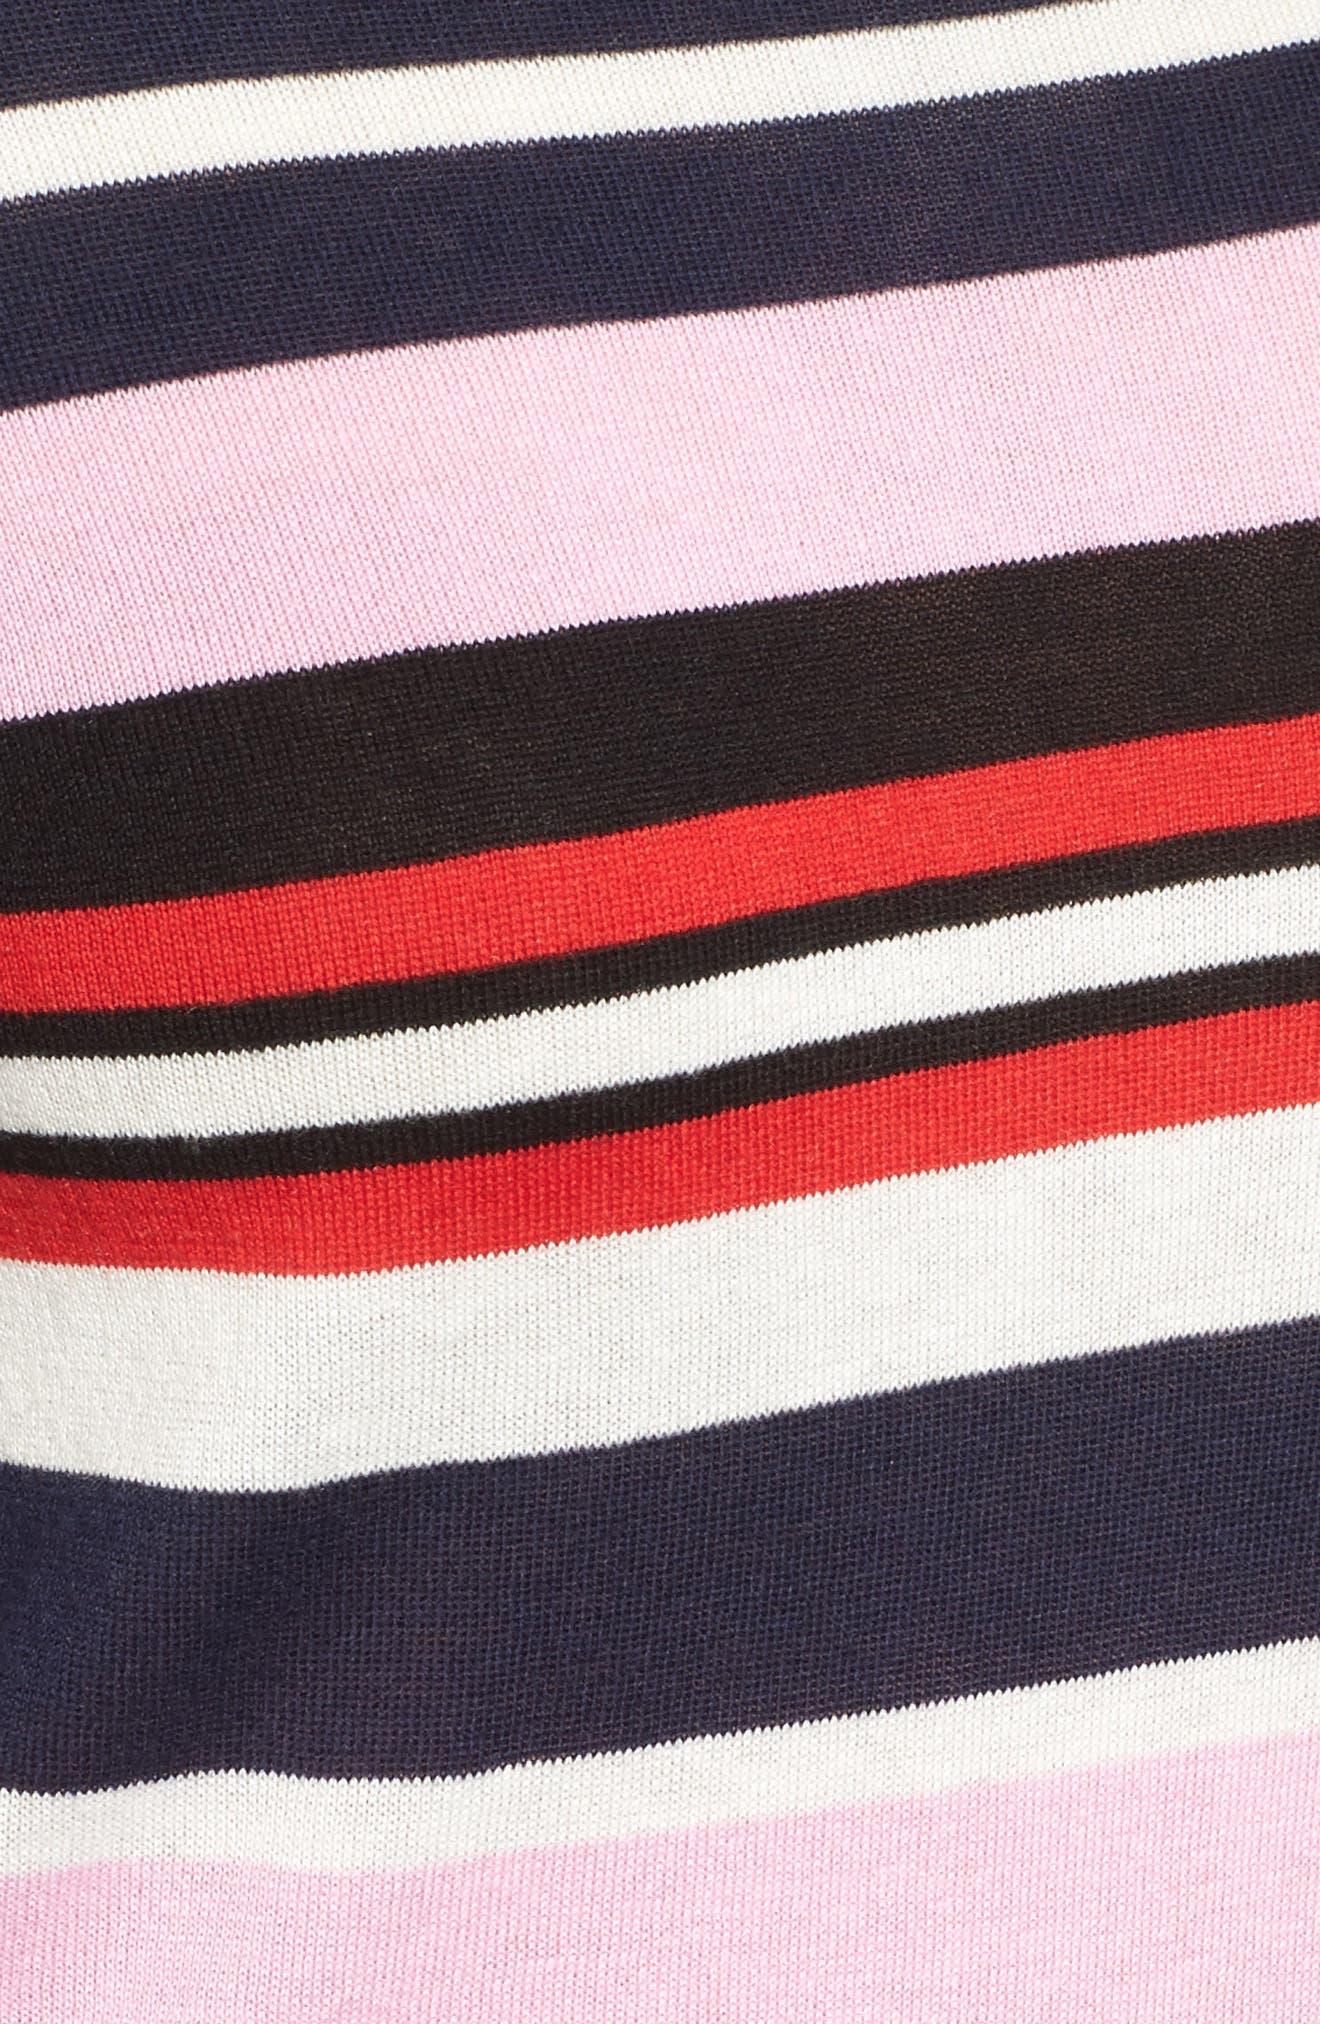 Cotton Blend Pullover,                             Alternate thumbnail 135, color,